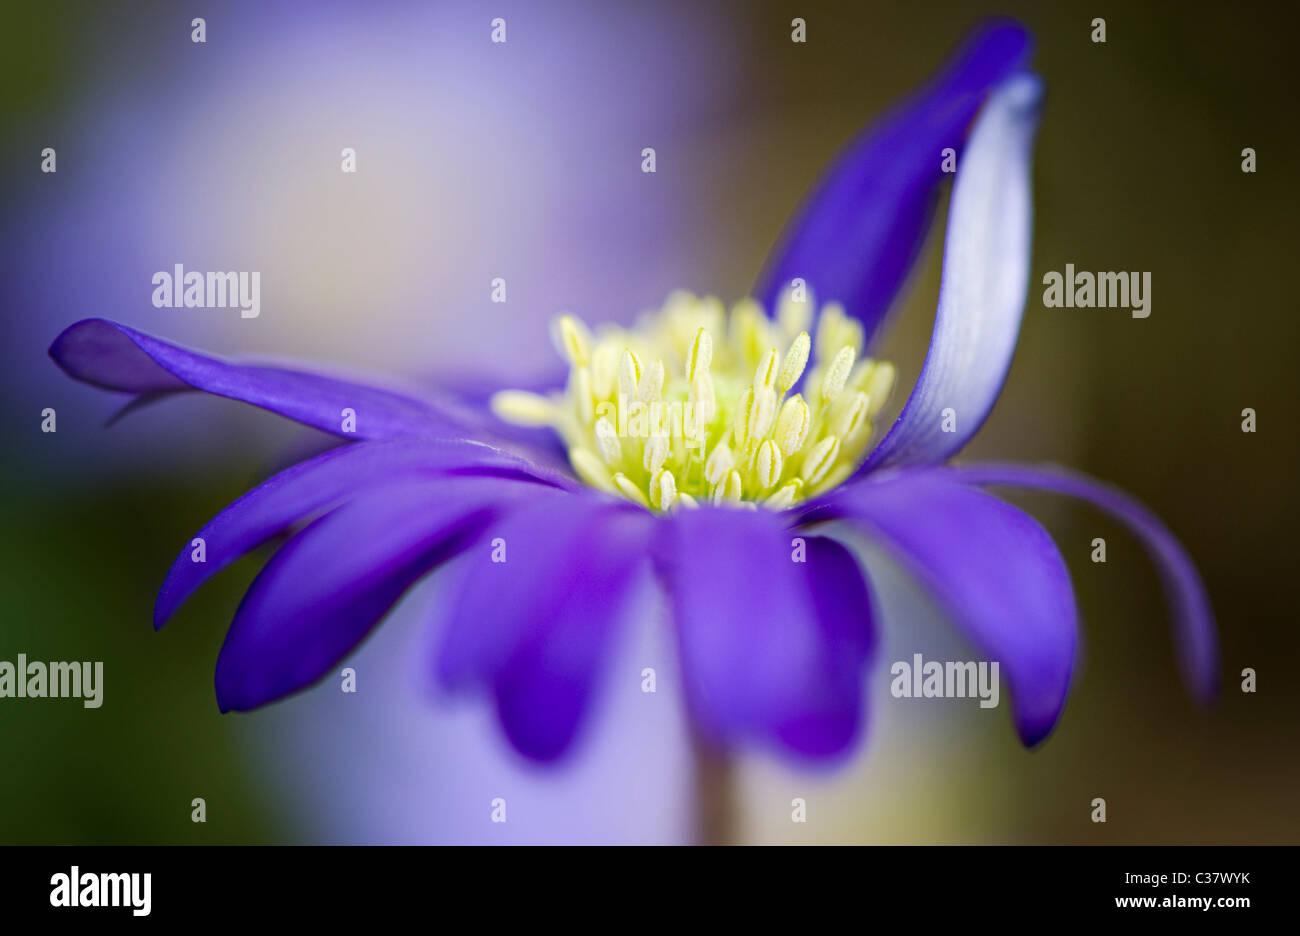 Anemone Blanda Bulbs Stockfotos & Anemone Blanda Bulbs Bilder - Alamy